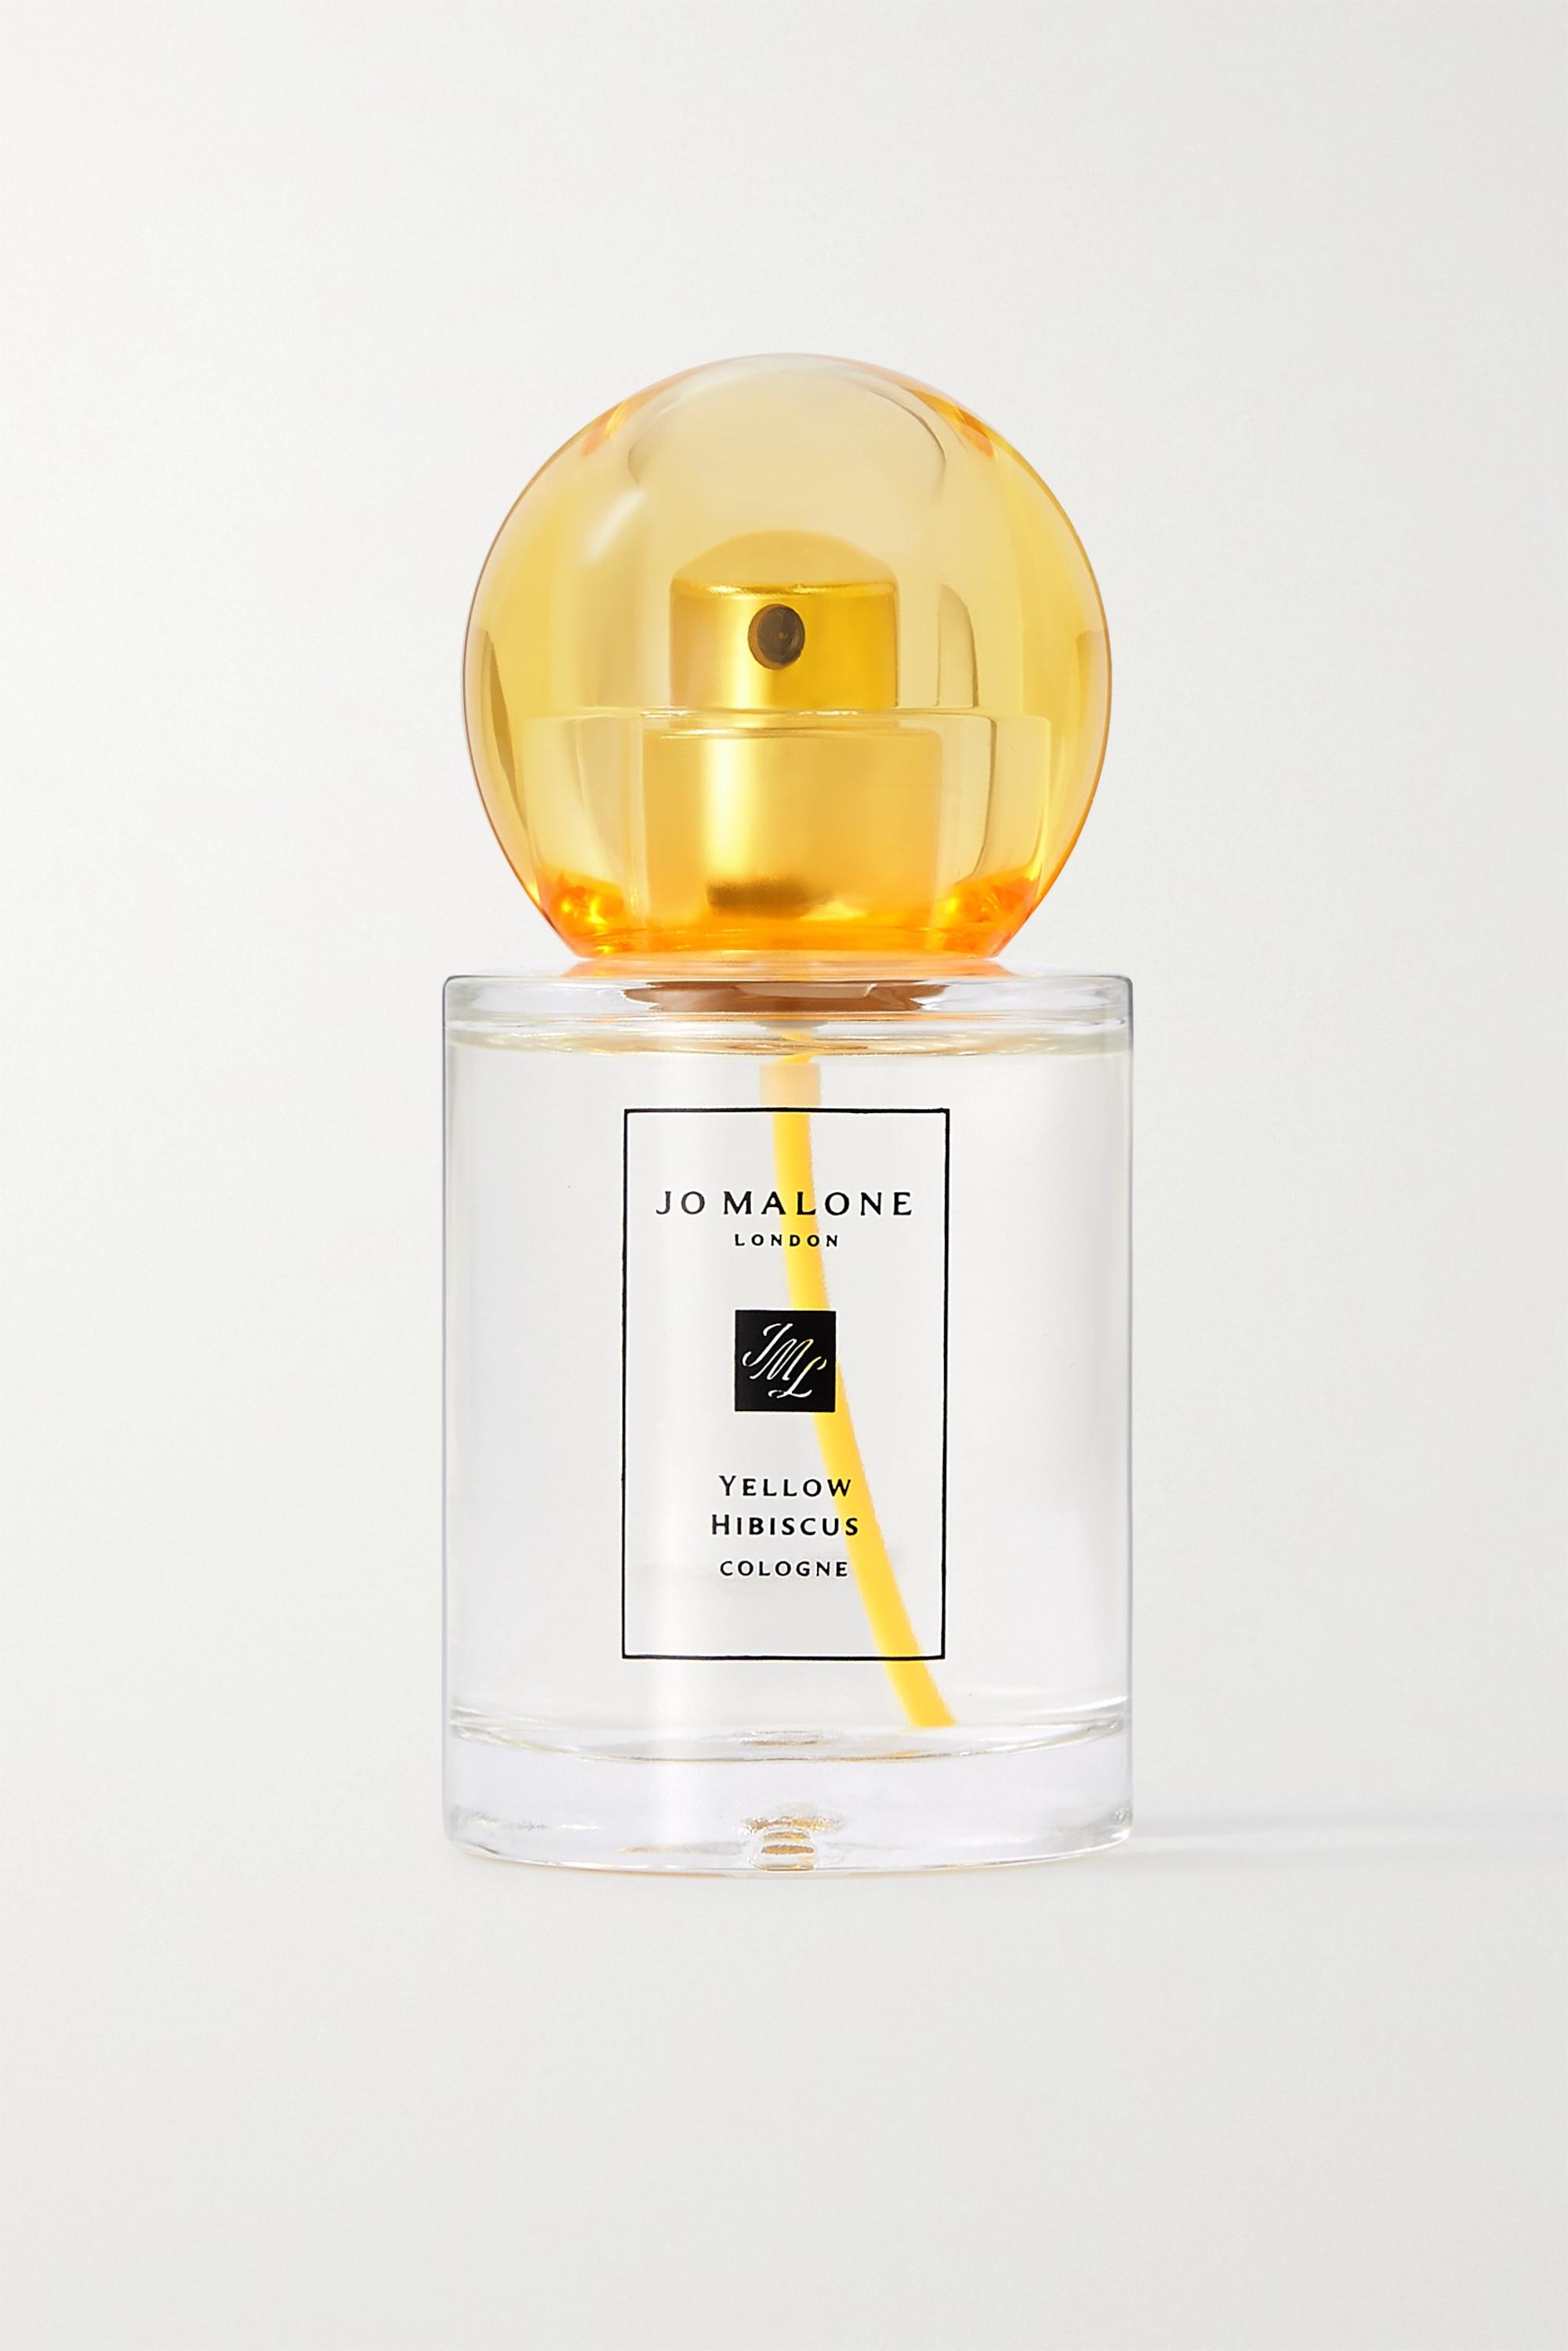 Jo Malone London - Cologne - Yellow Hibiscus, 30ml